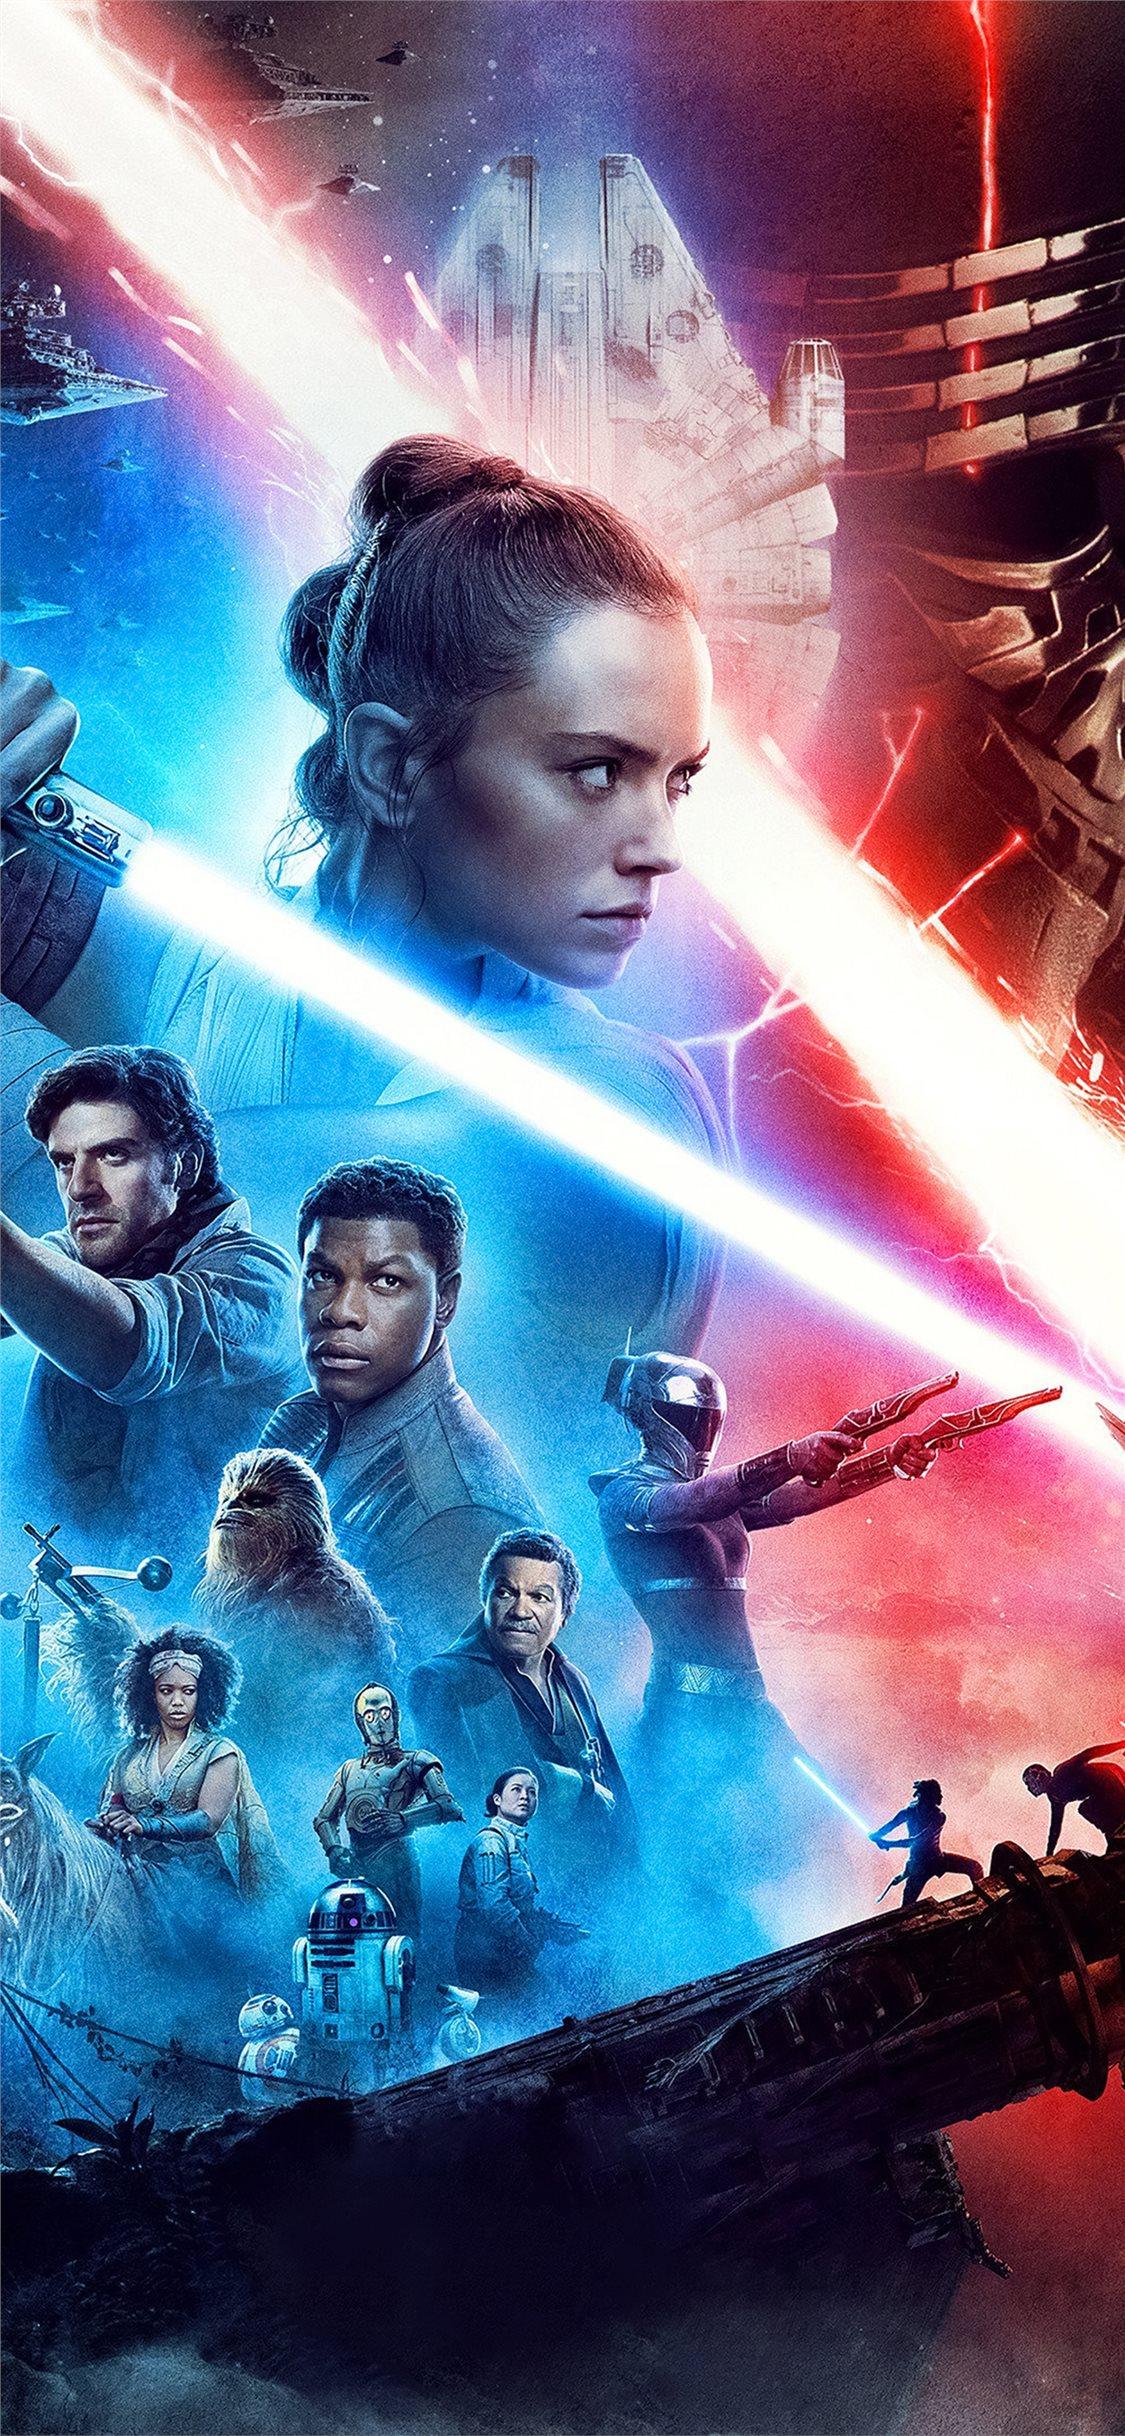 Best Star Wars The Rise Of Skywalker Iphone X Wallpapers Hd 2020 Ilikewallpaper